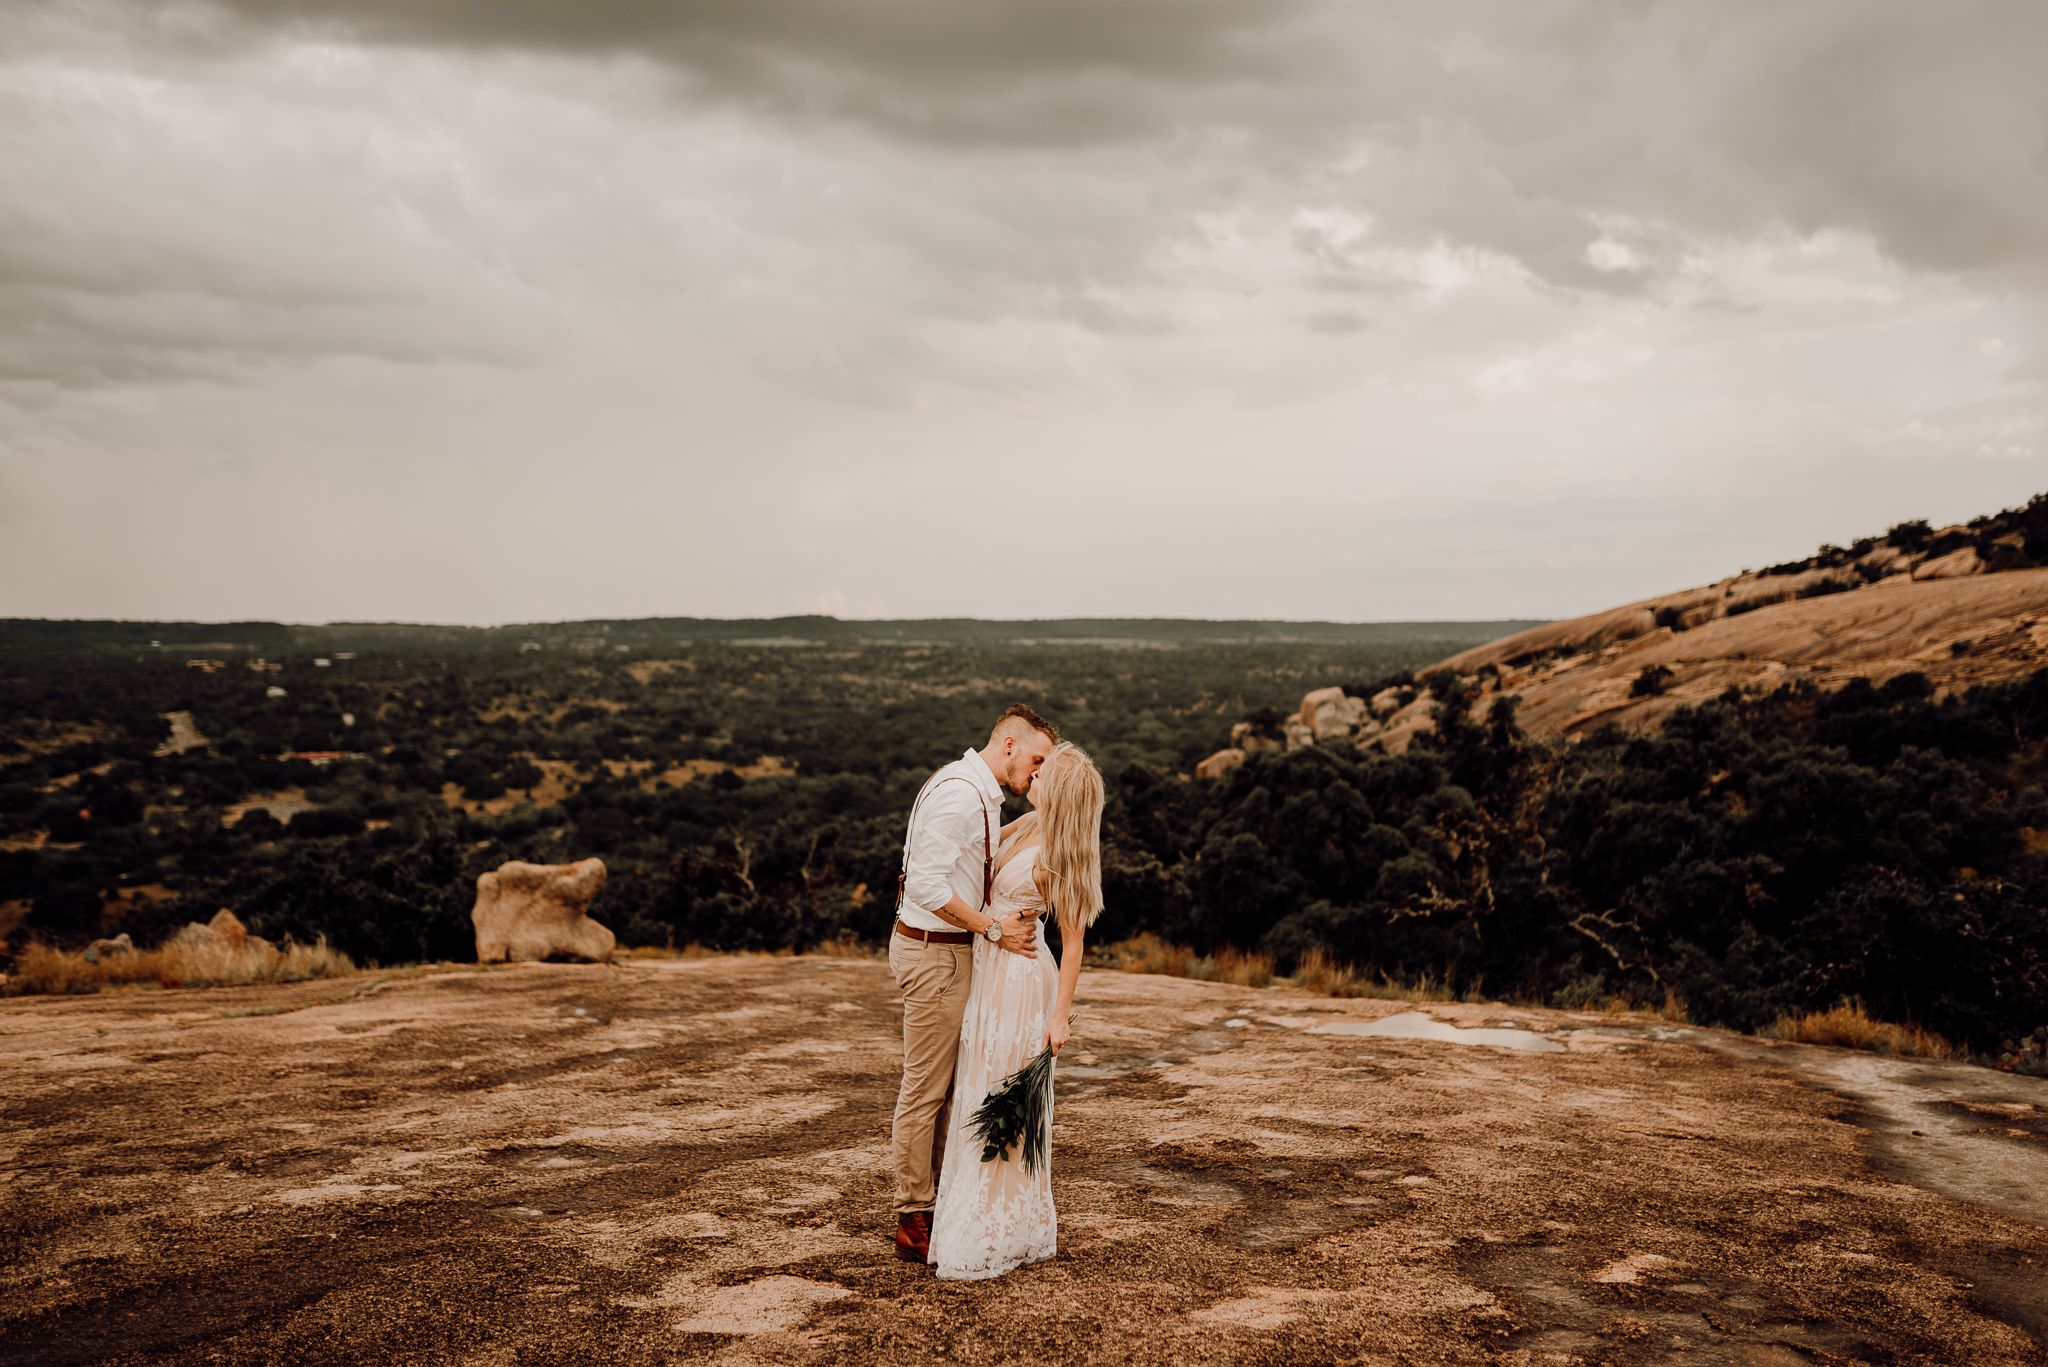 texas-elopement-photographer-enchanted-rock-10-blog.jpg